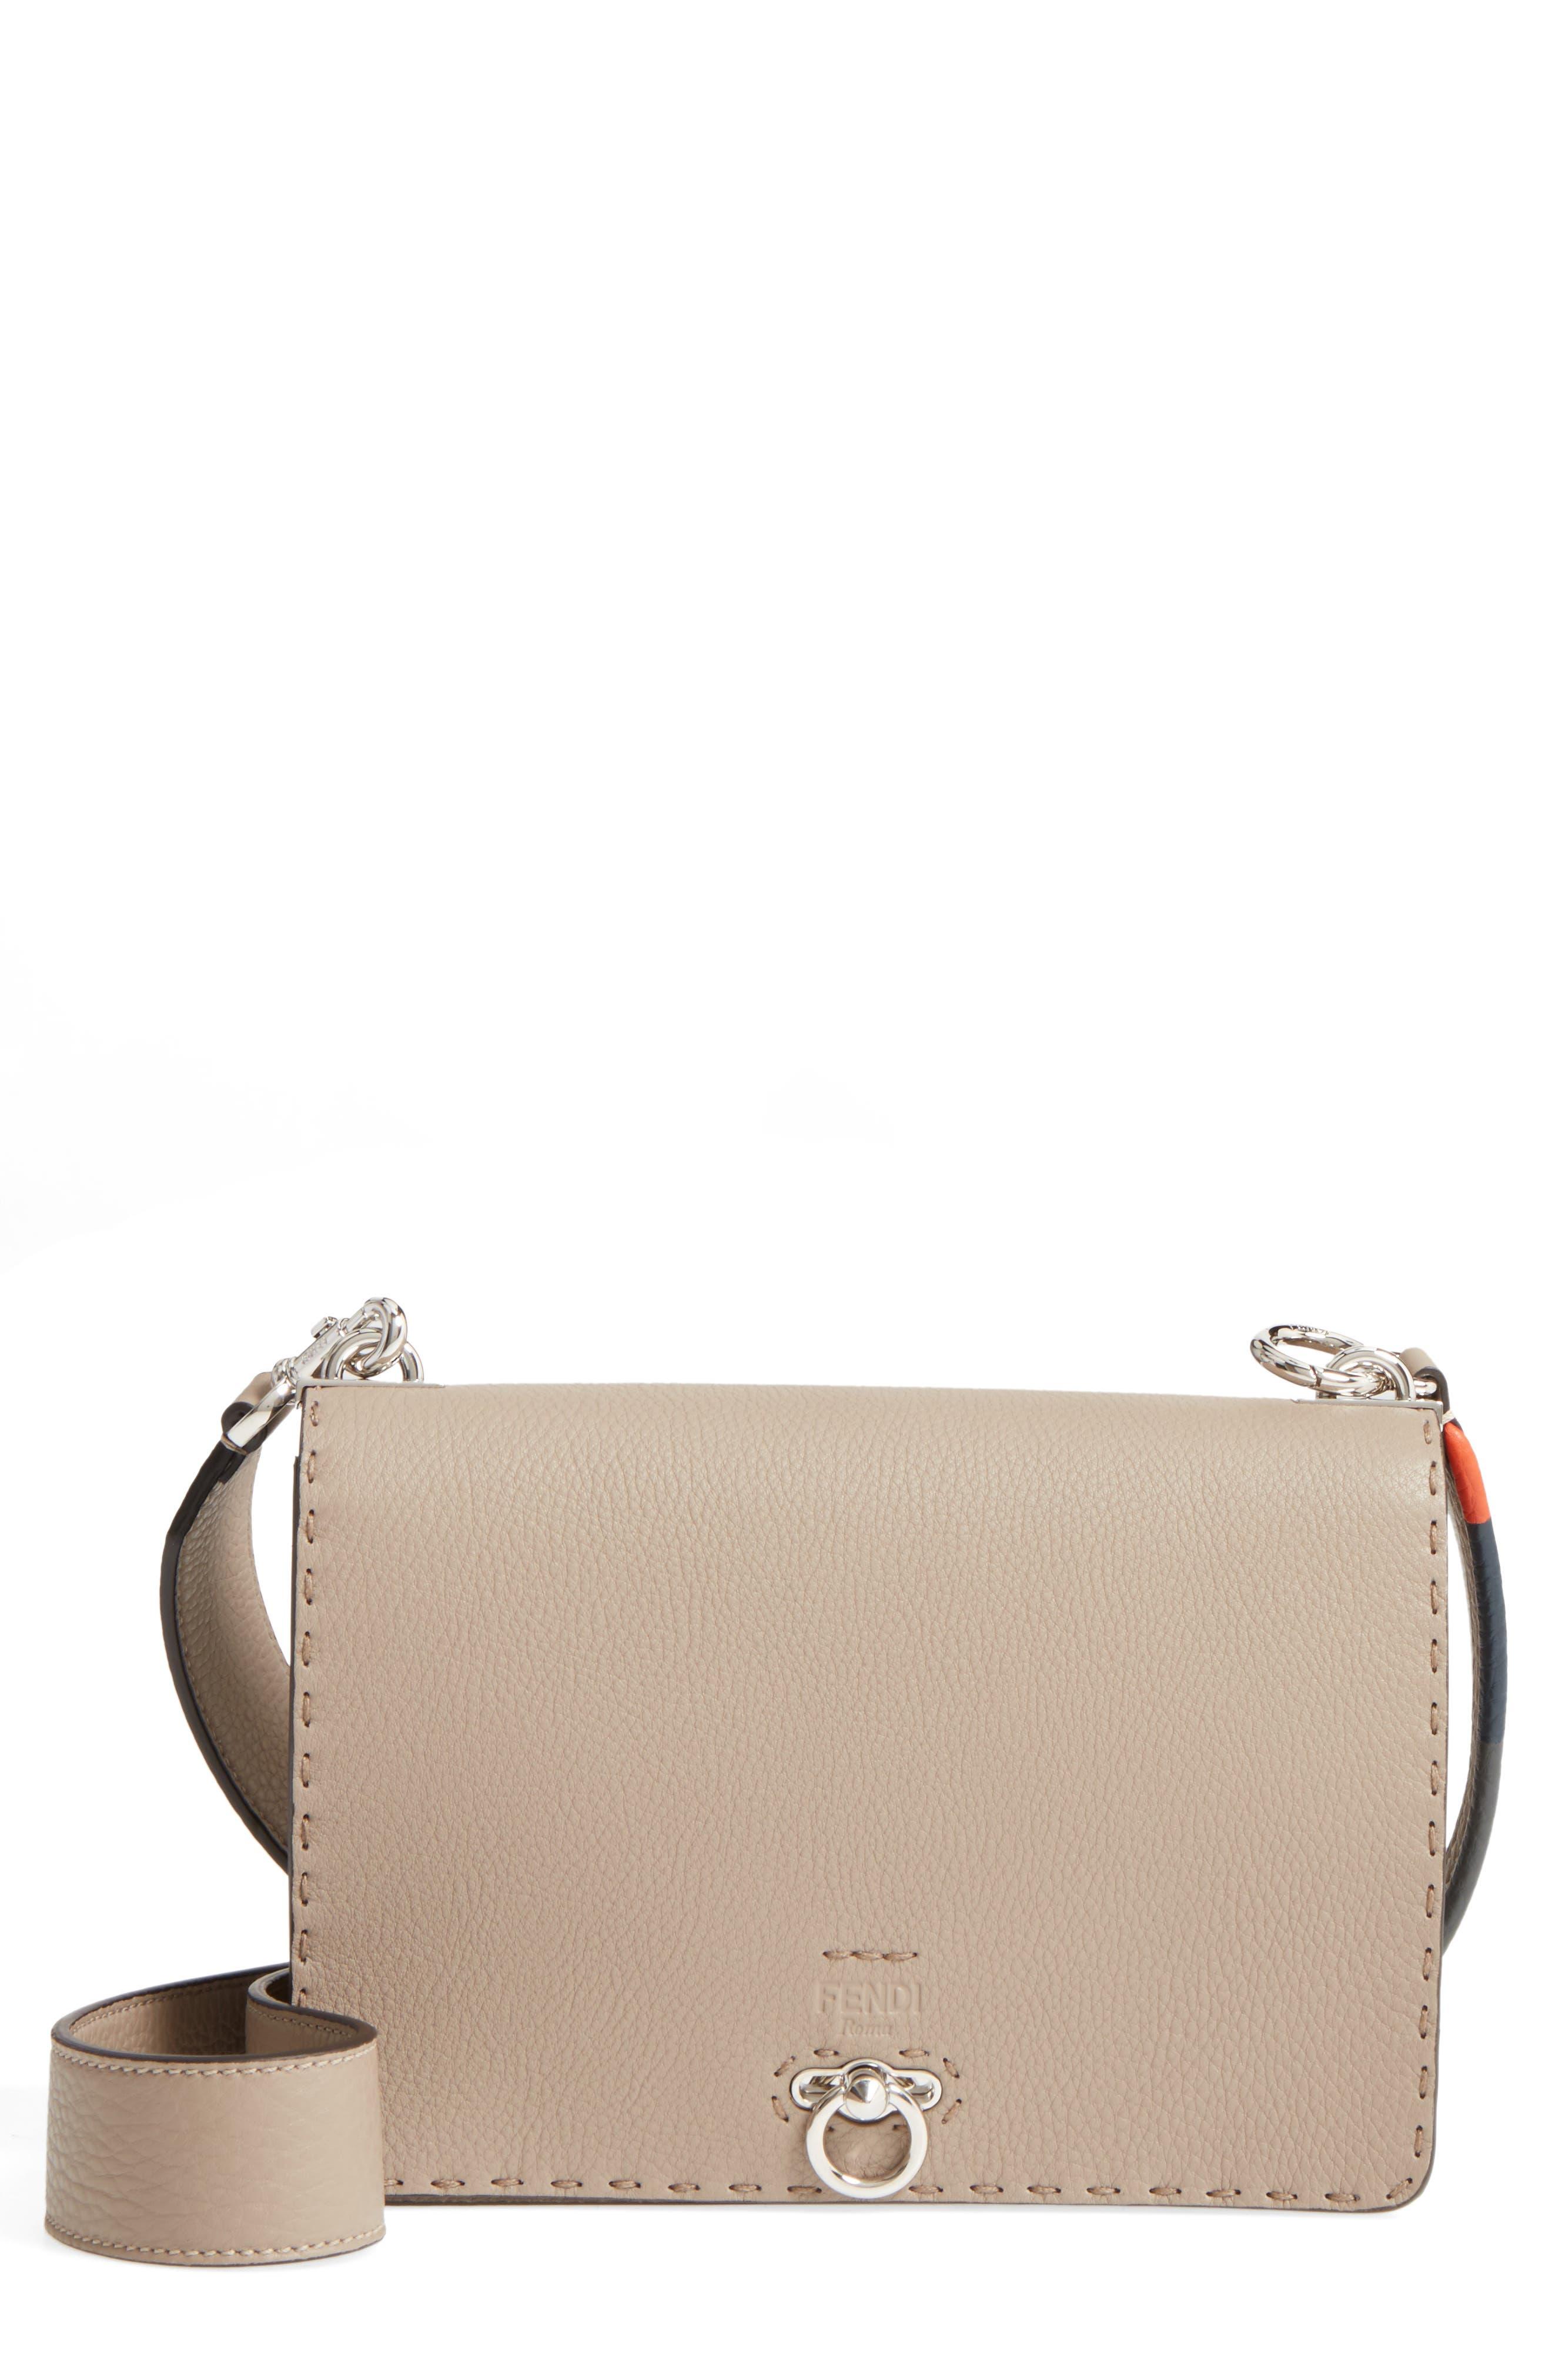 Fendi Pebbled Leather Messenger Bag